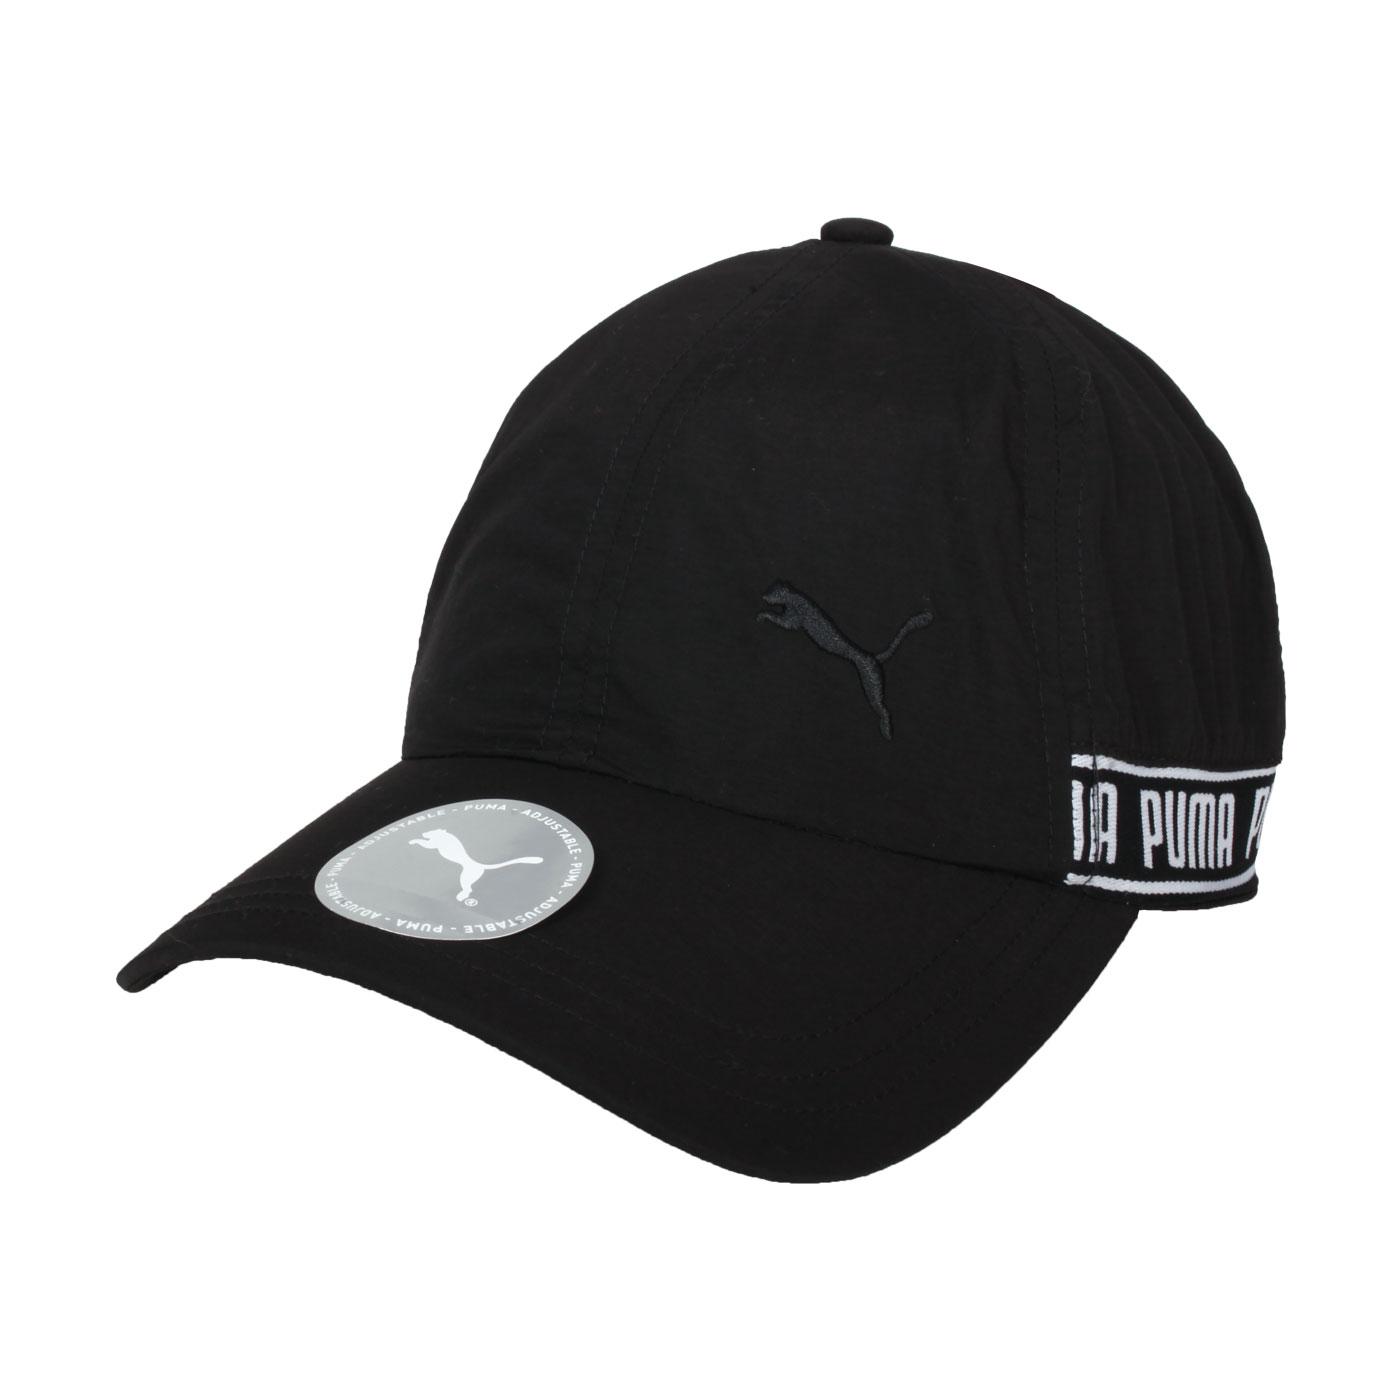 PUMA 棒球帽 02285401 - 黑白